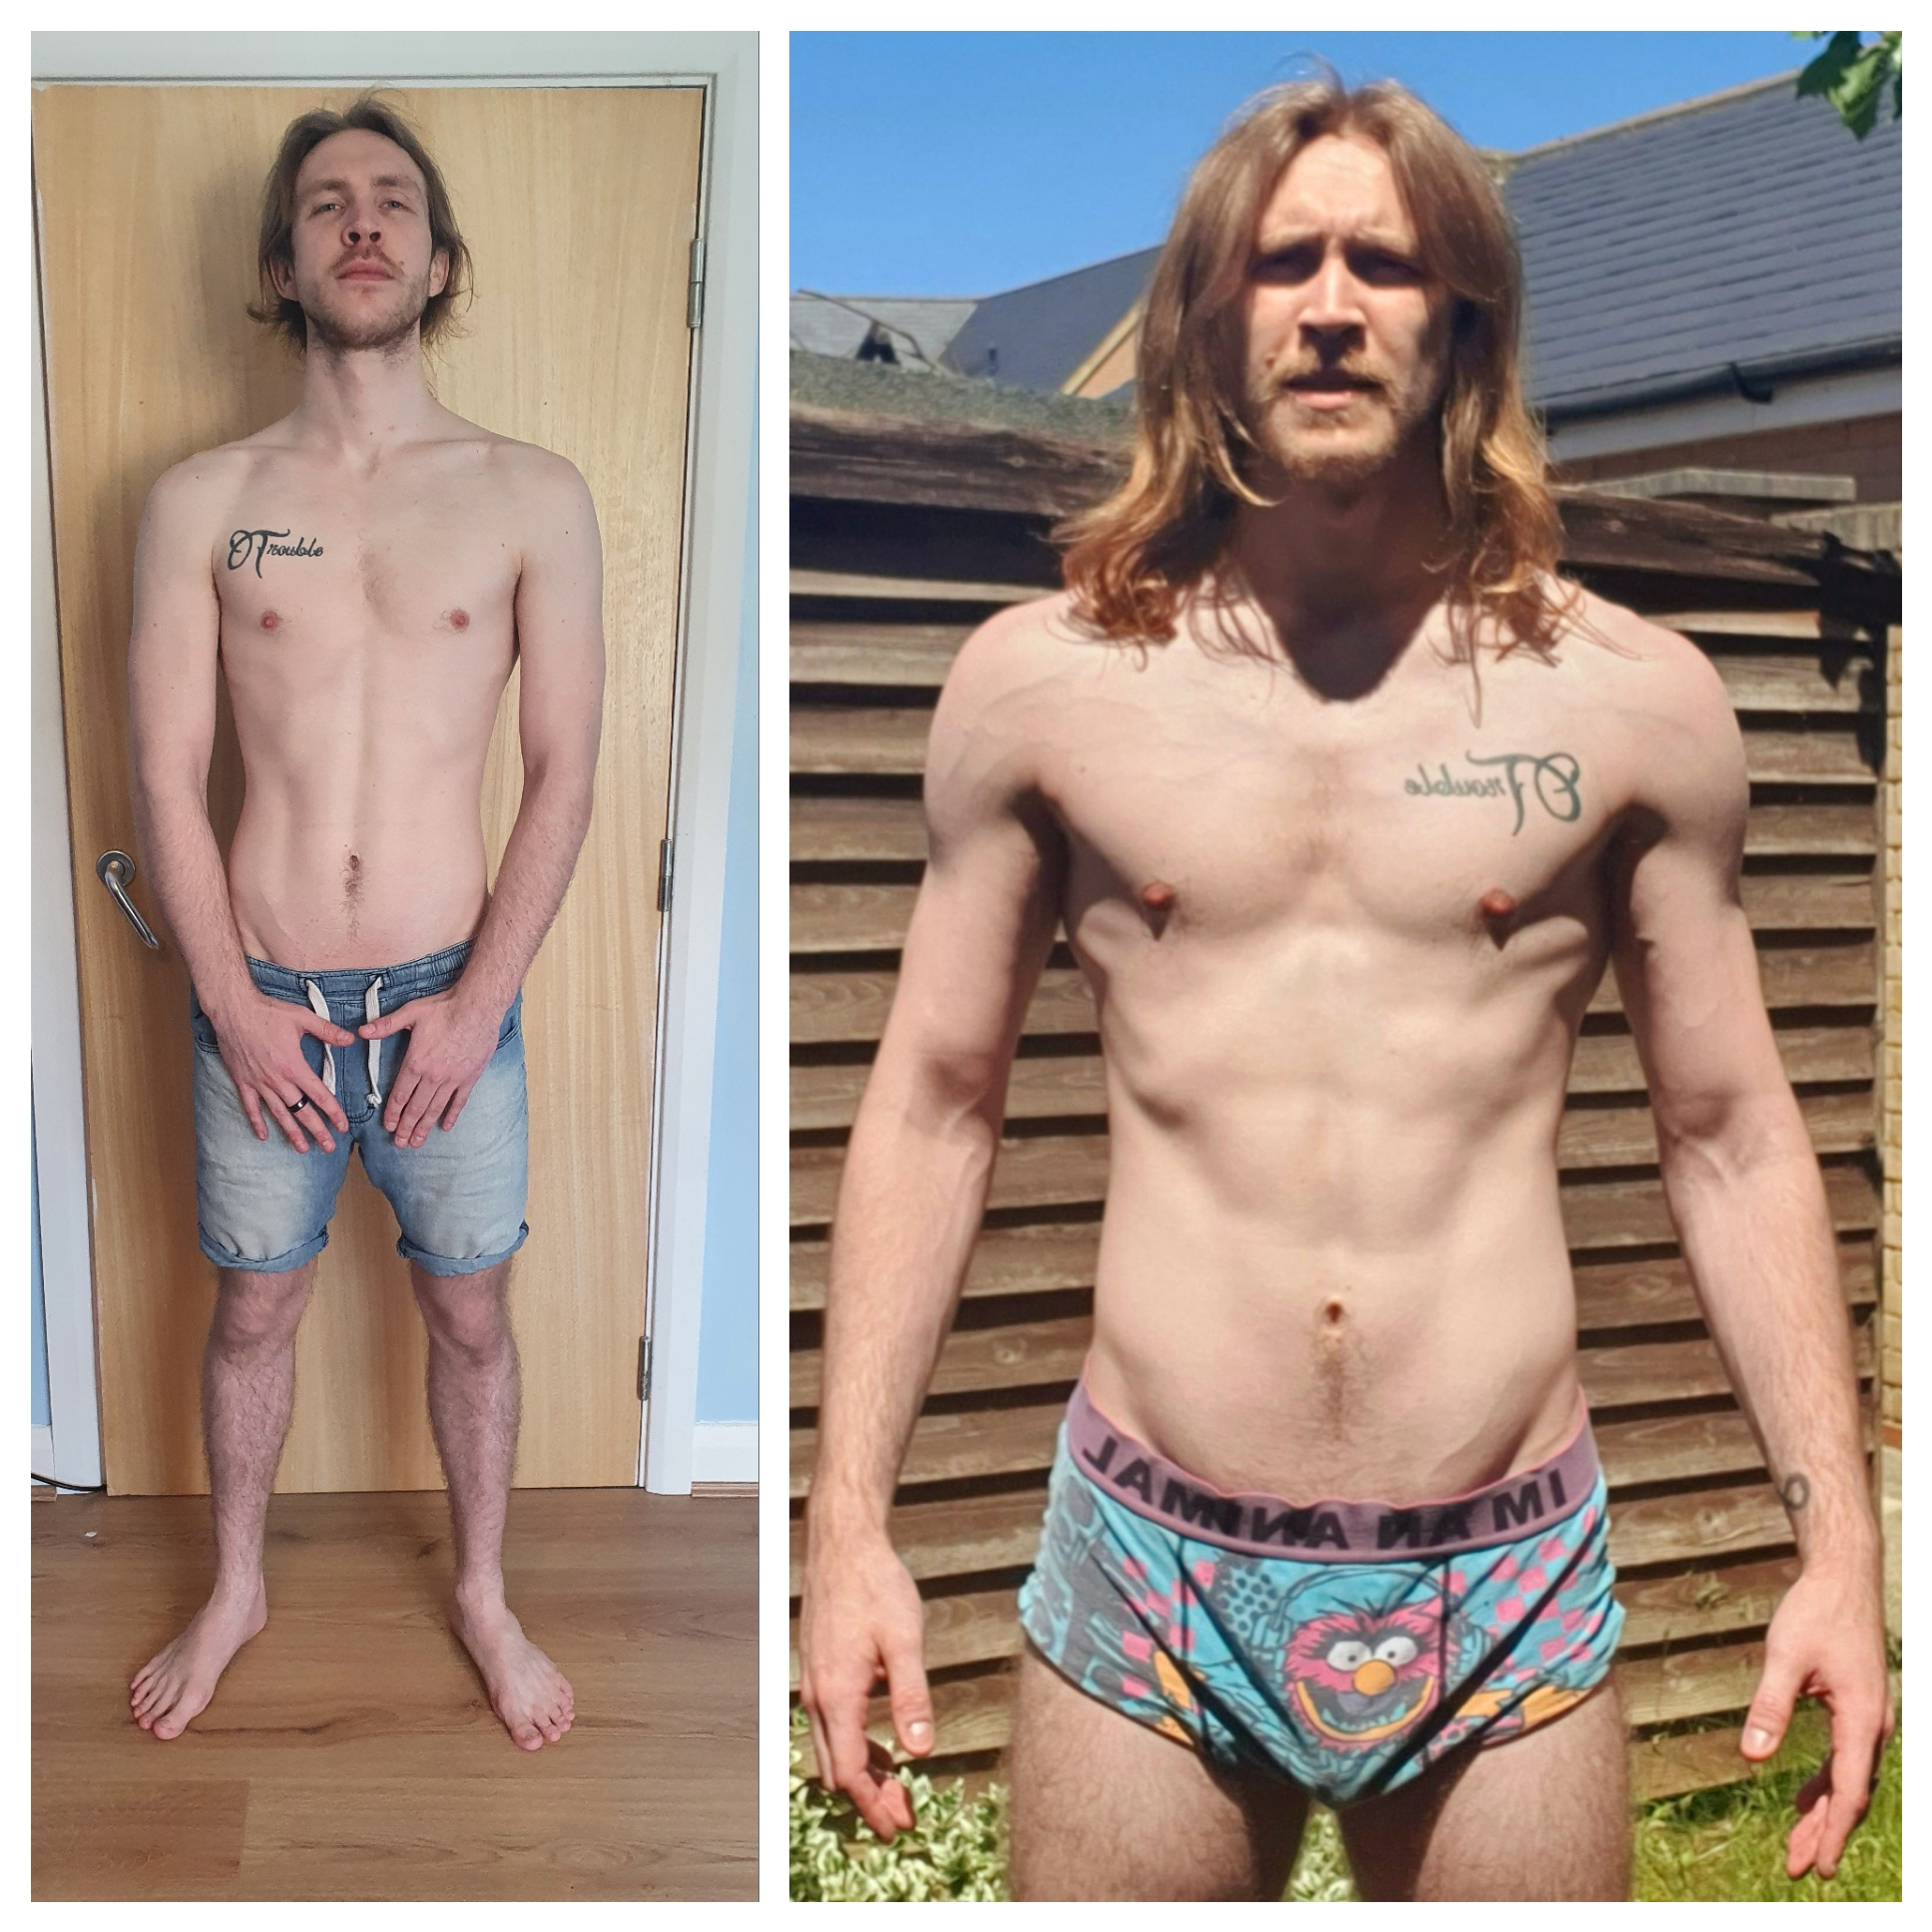 6'1 Male Progress Pics of 21 lbs Muscle Gain 147 lbs to 168 lbs